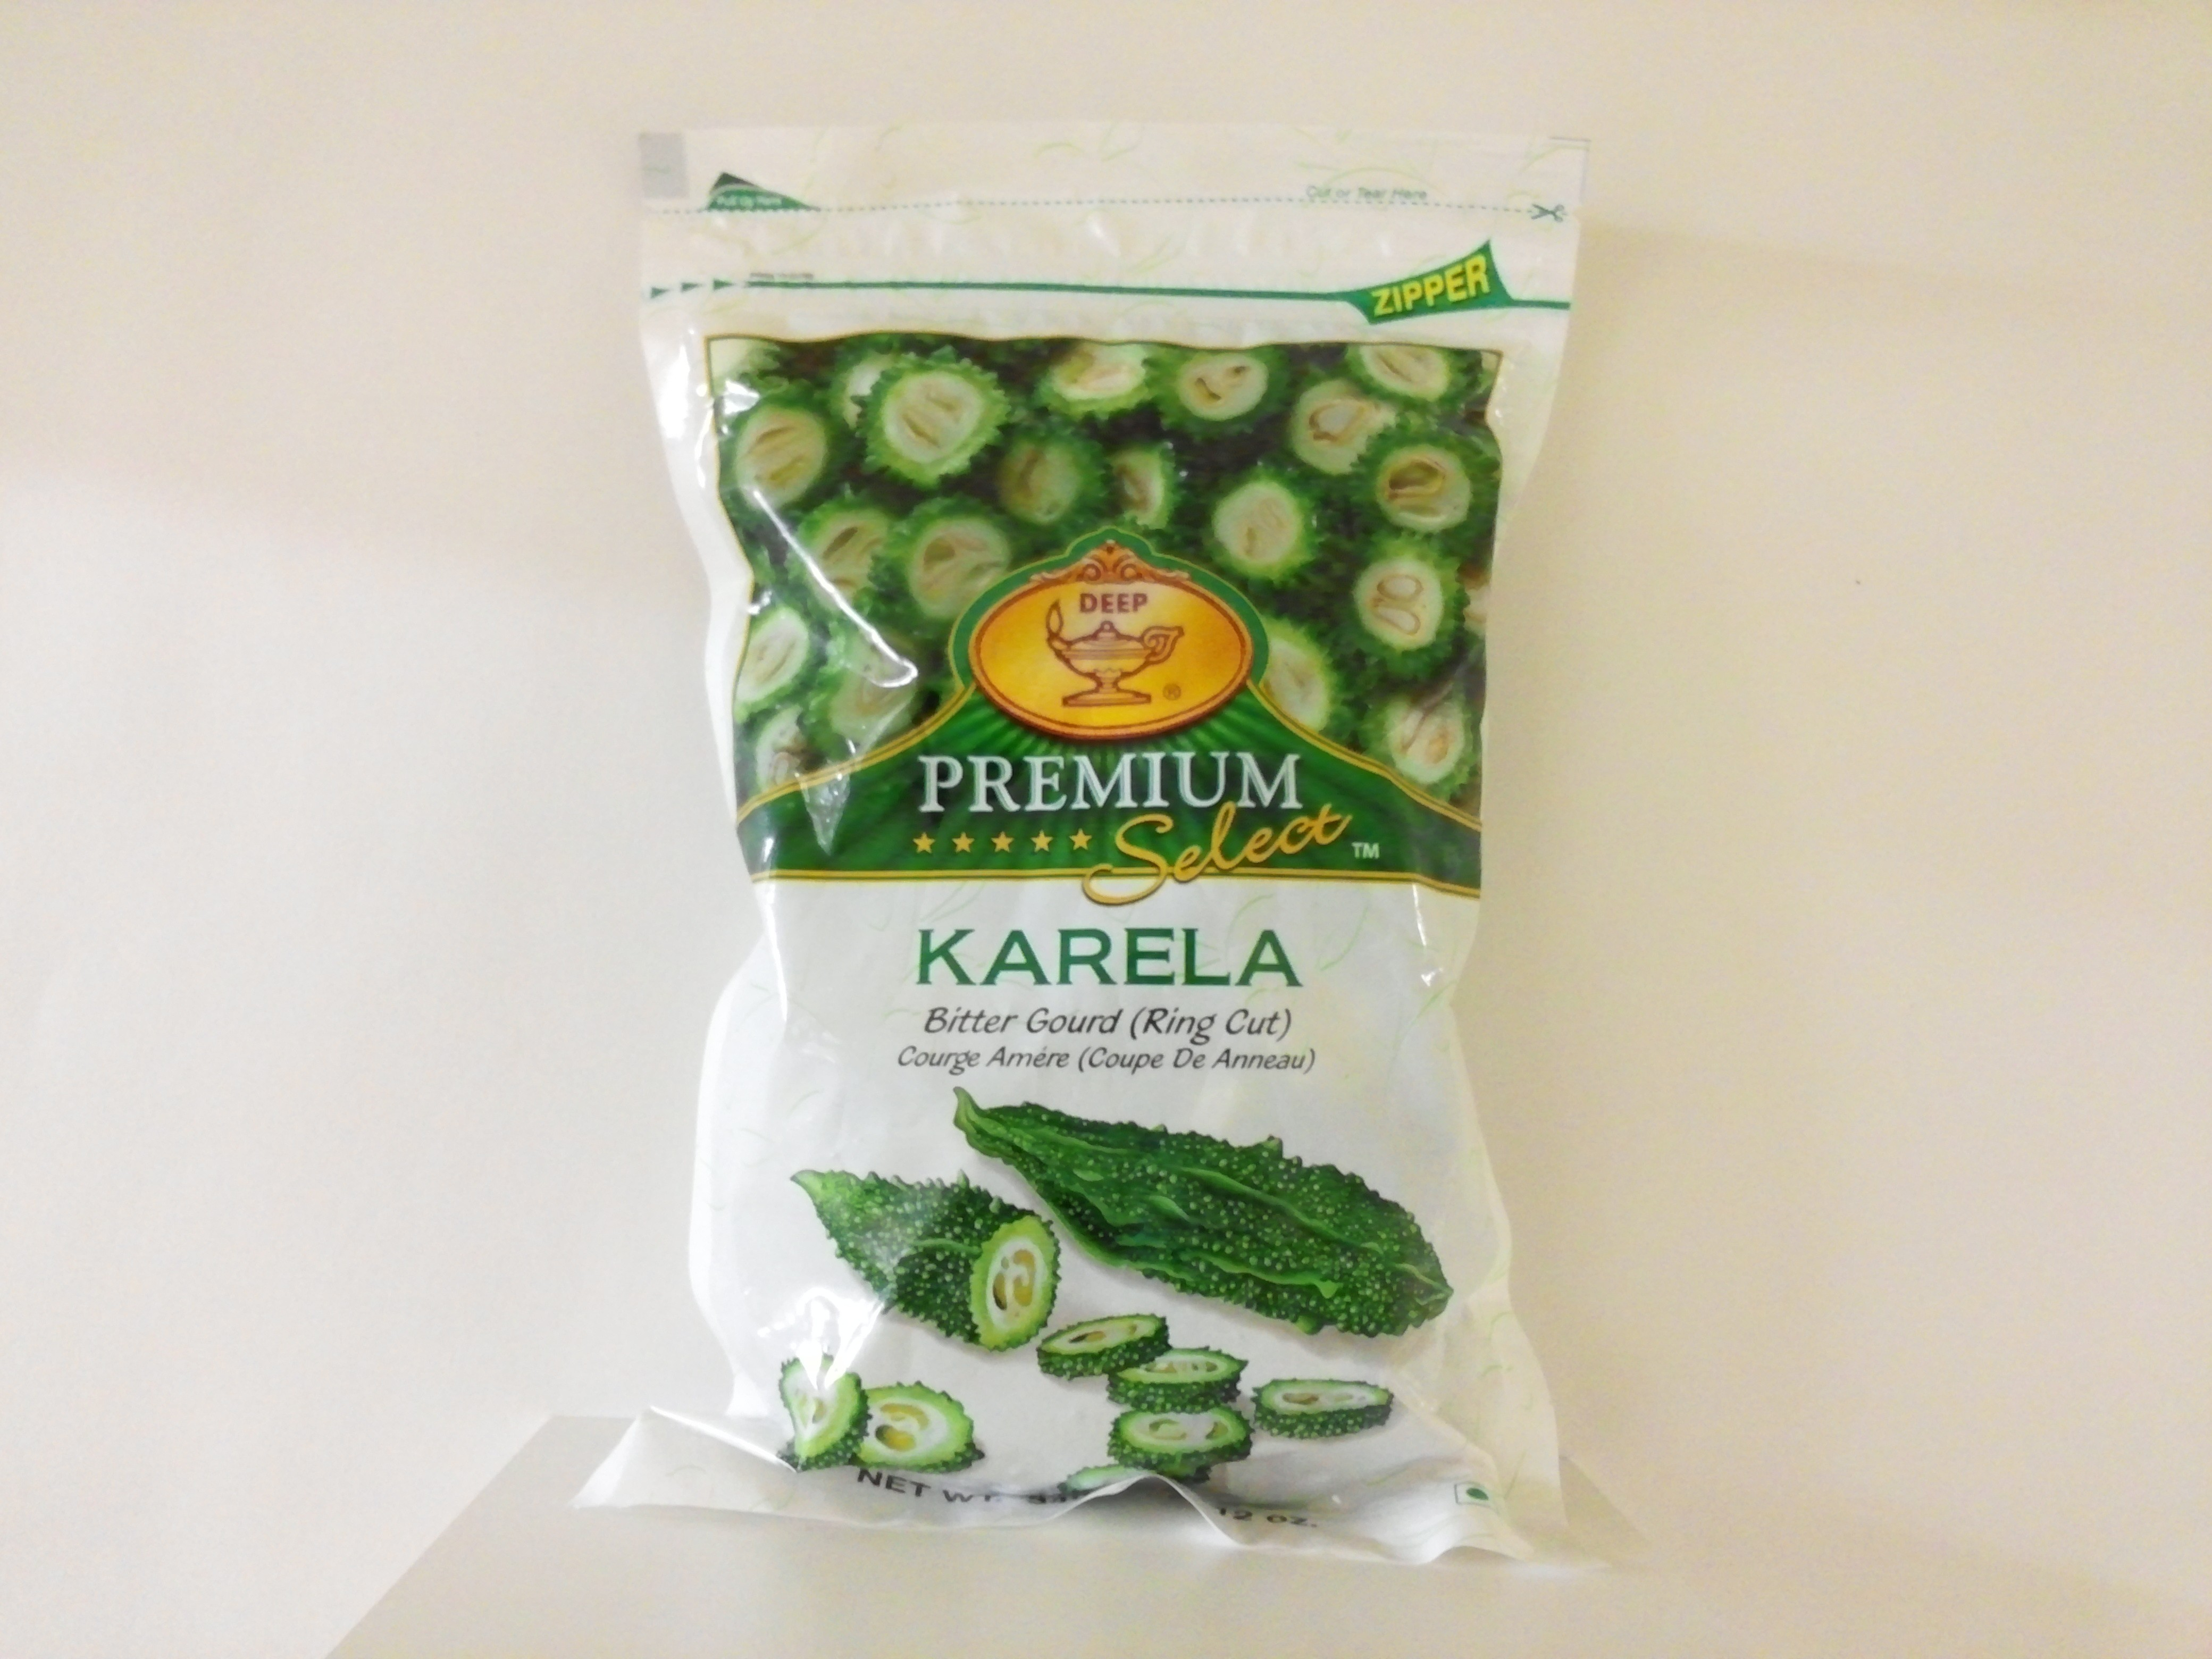 Frozen Karela 12 oz